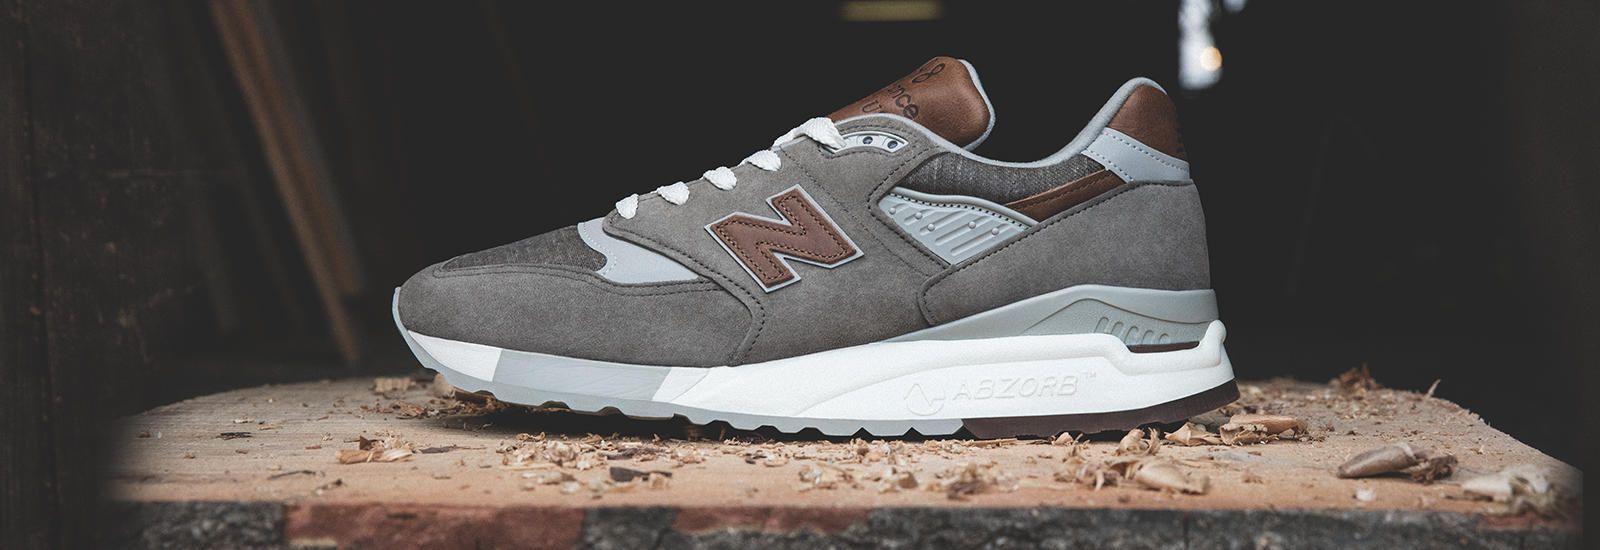 new balance 998 grey hombre